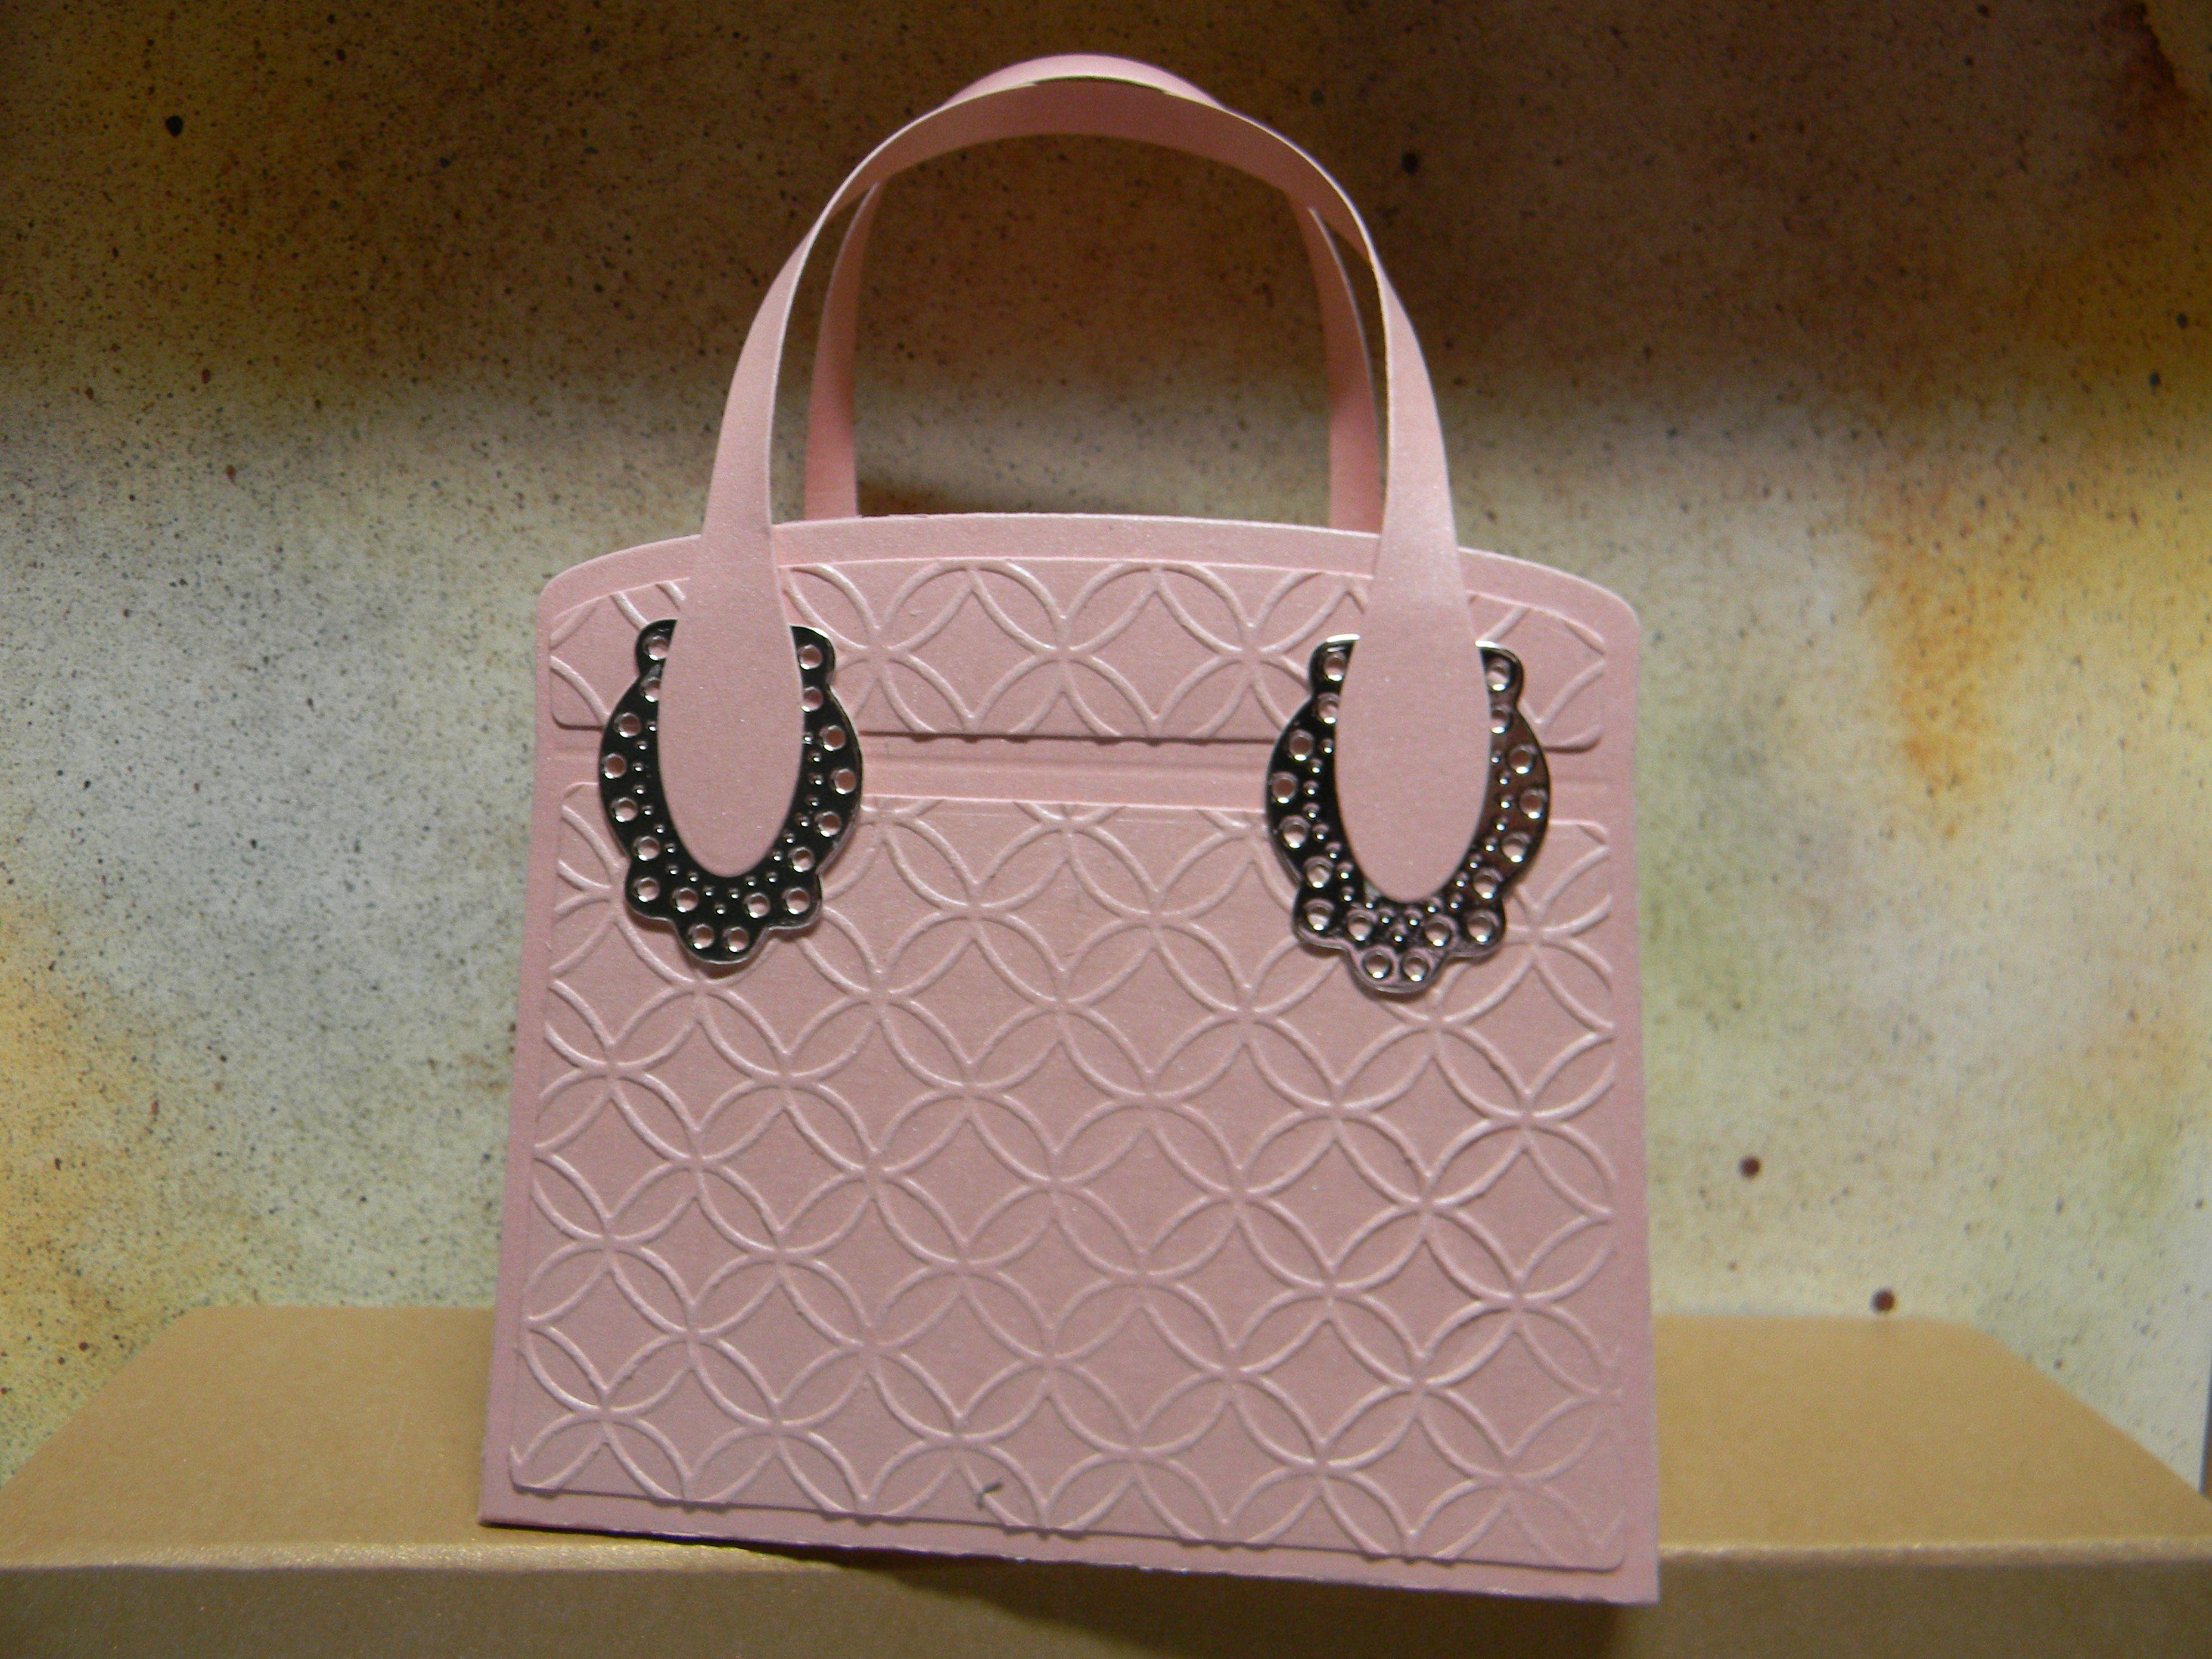 Tonic Kensington Handbag Set By